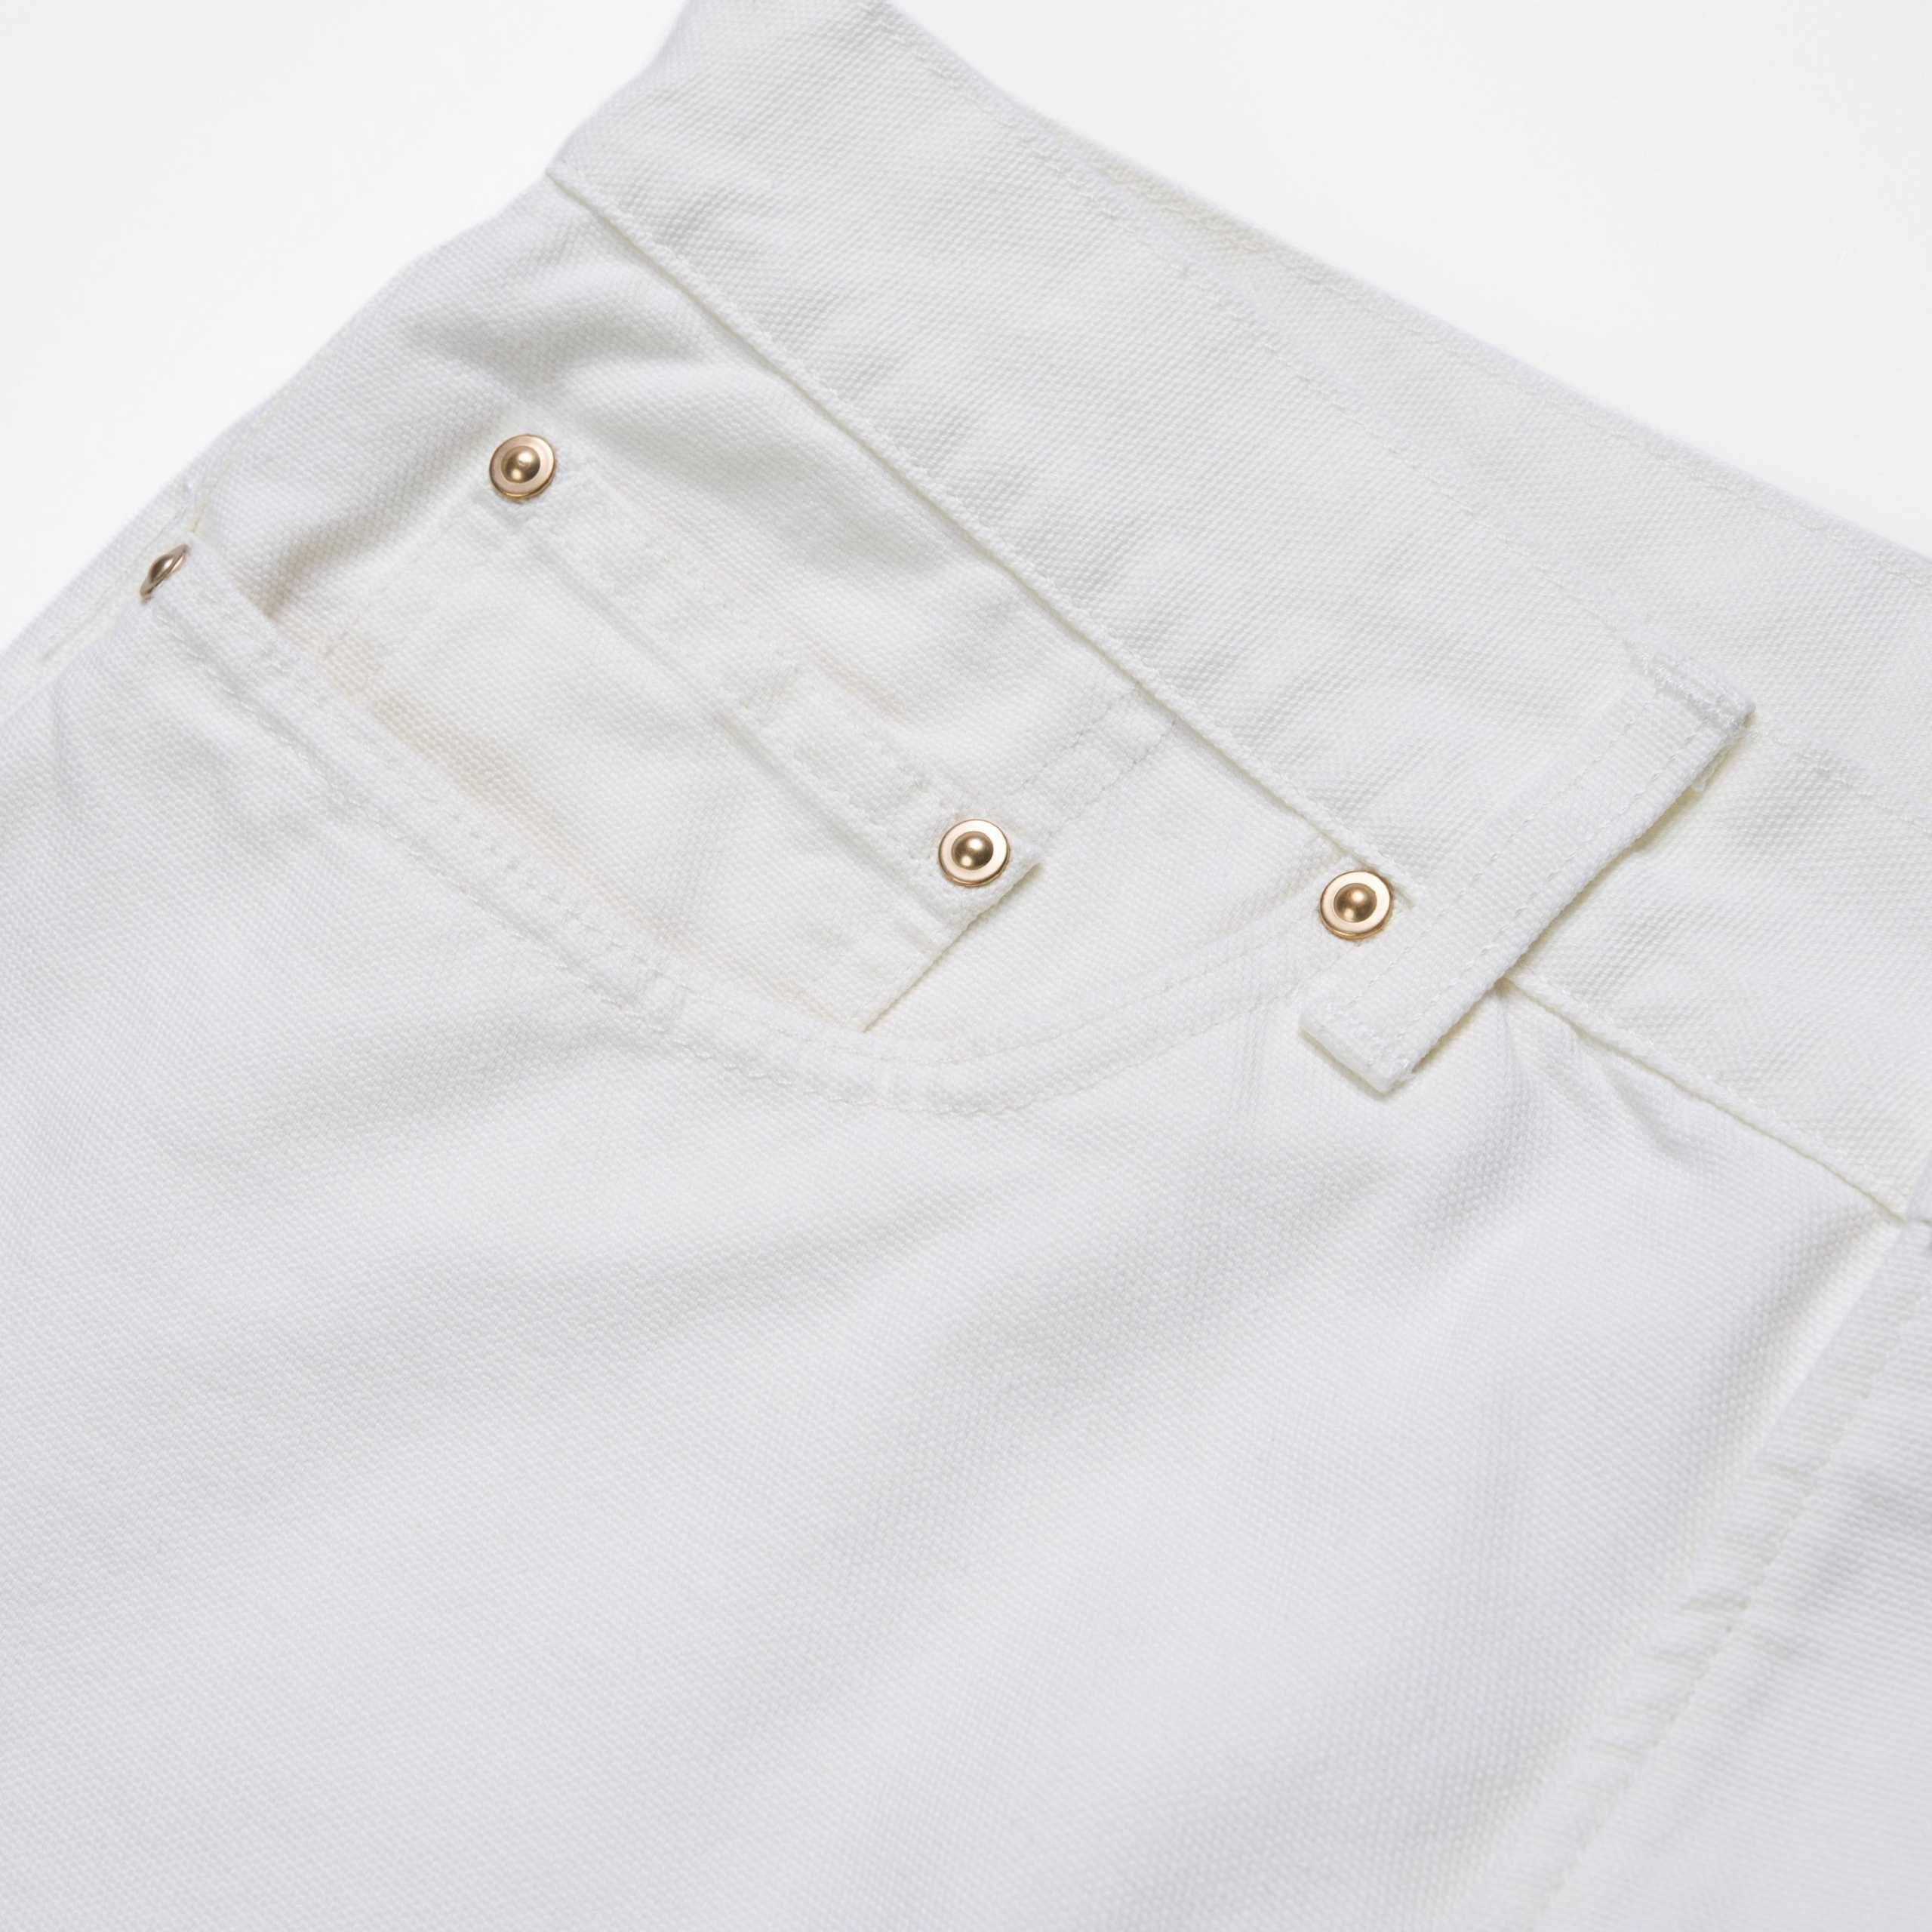 Carhartt Wip Pontiac Pant Carhartt Wip Com Pants Pocket Jeans Carhartt